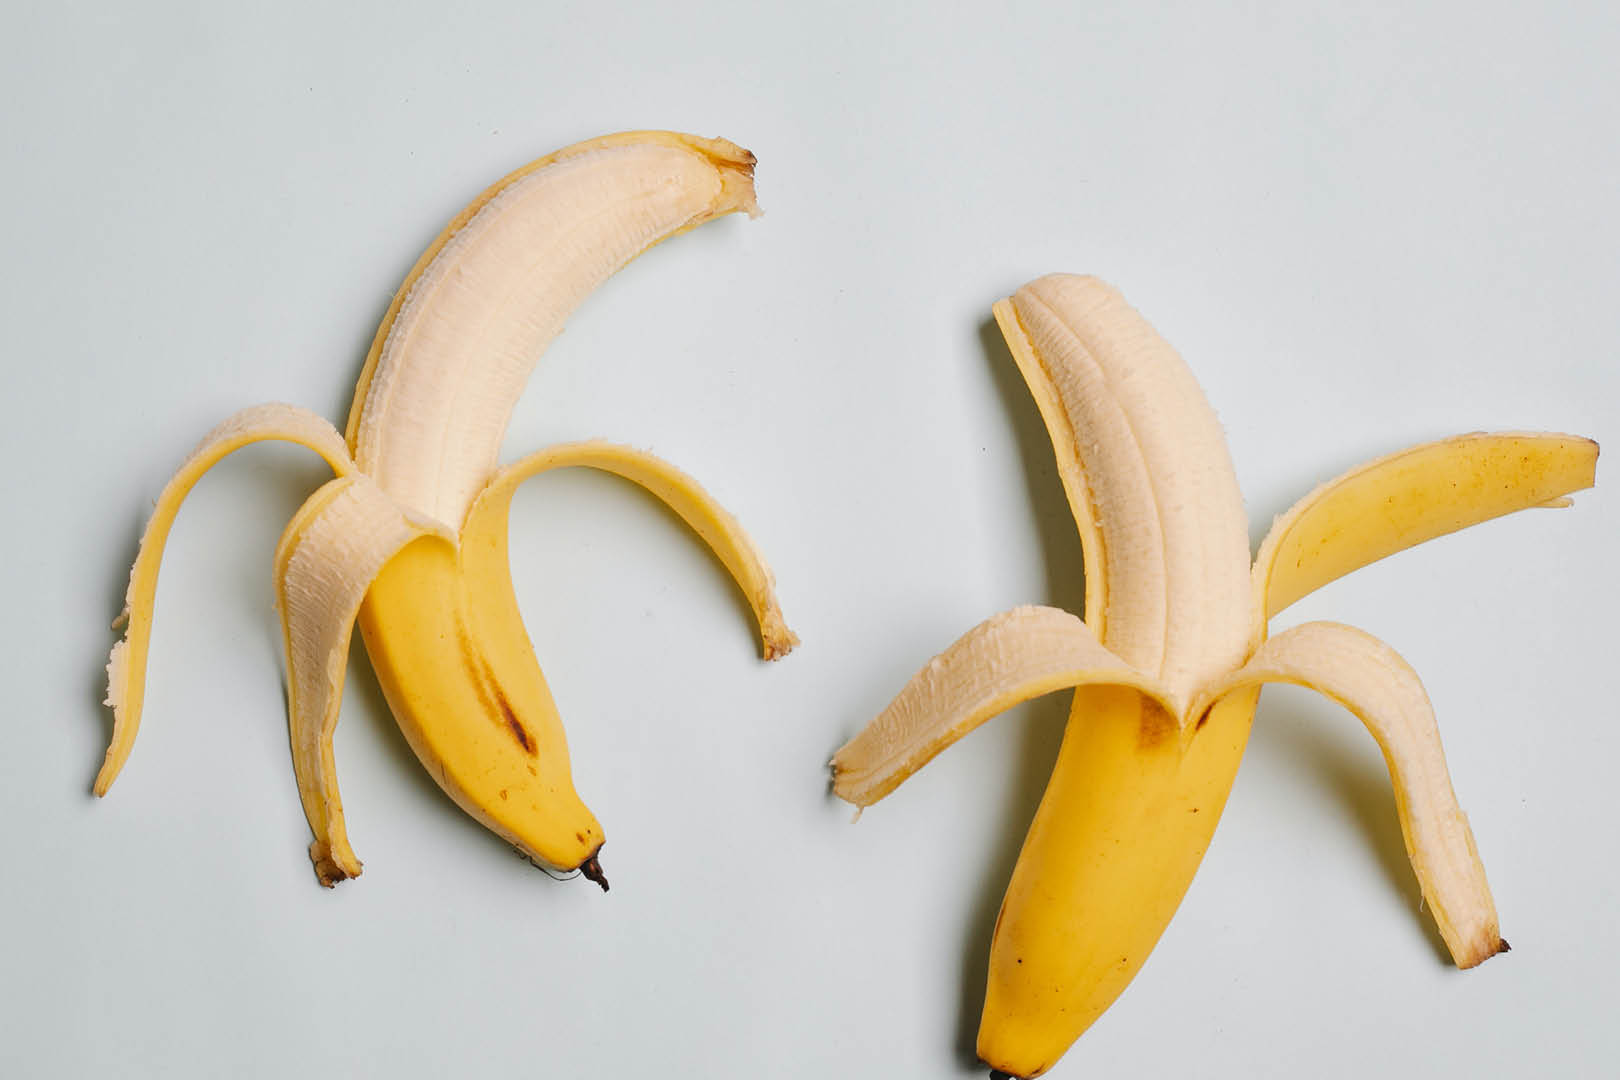 réutiliser-épluchures-fruits